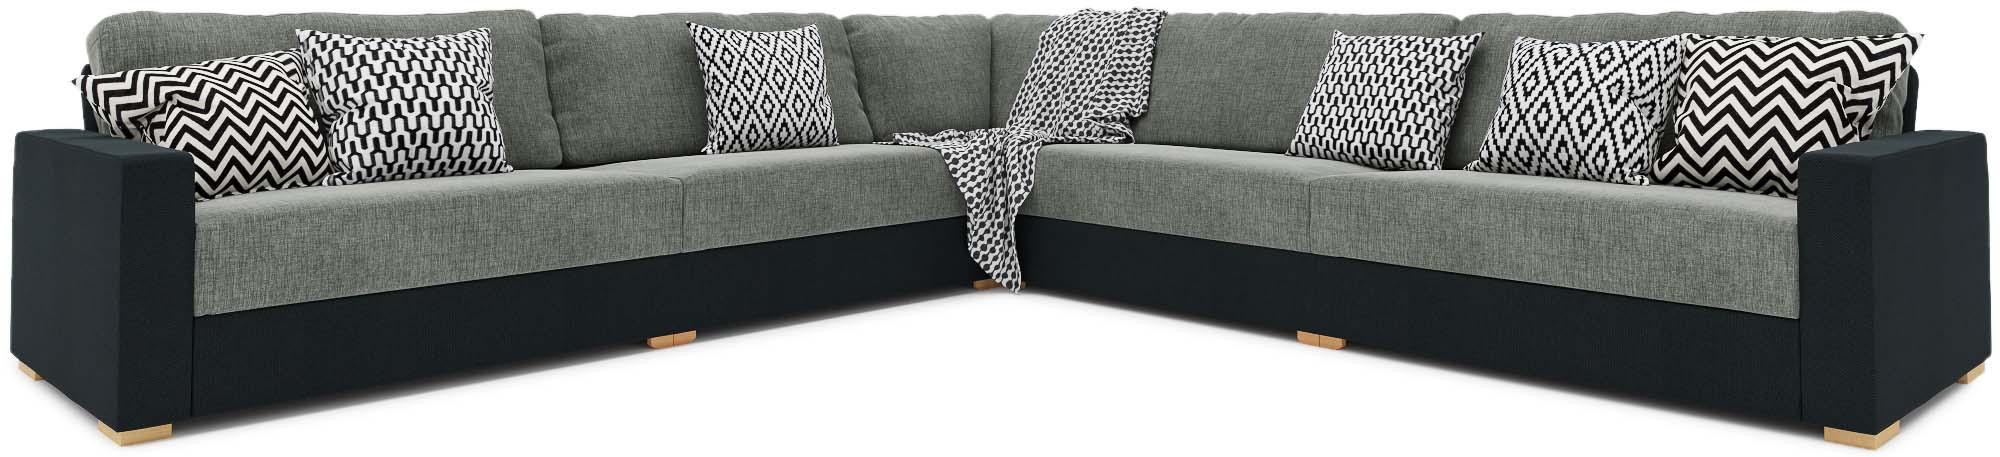 xan 3x3 corner sofa large fabric corner sofa nabru. Black Bedroom Furniture Sets. Home Design Ideas